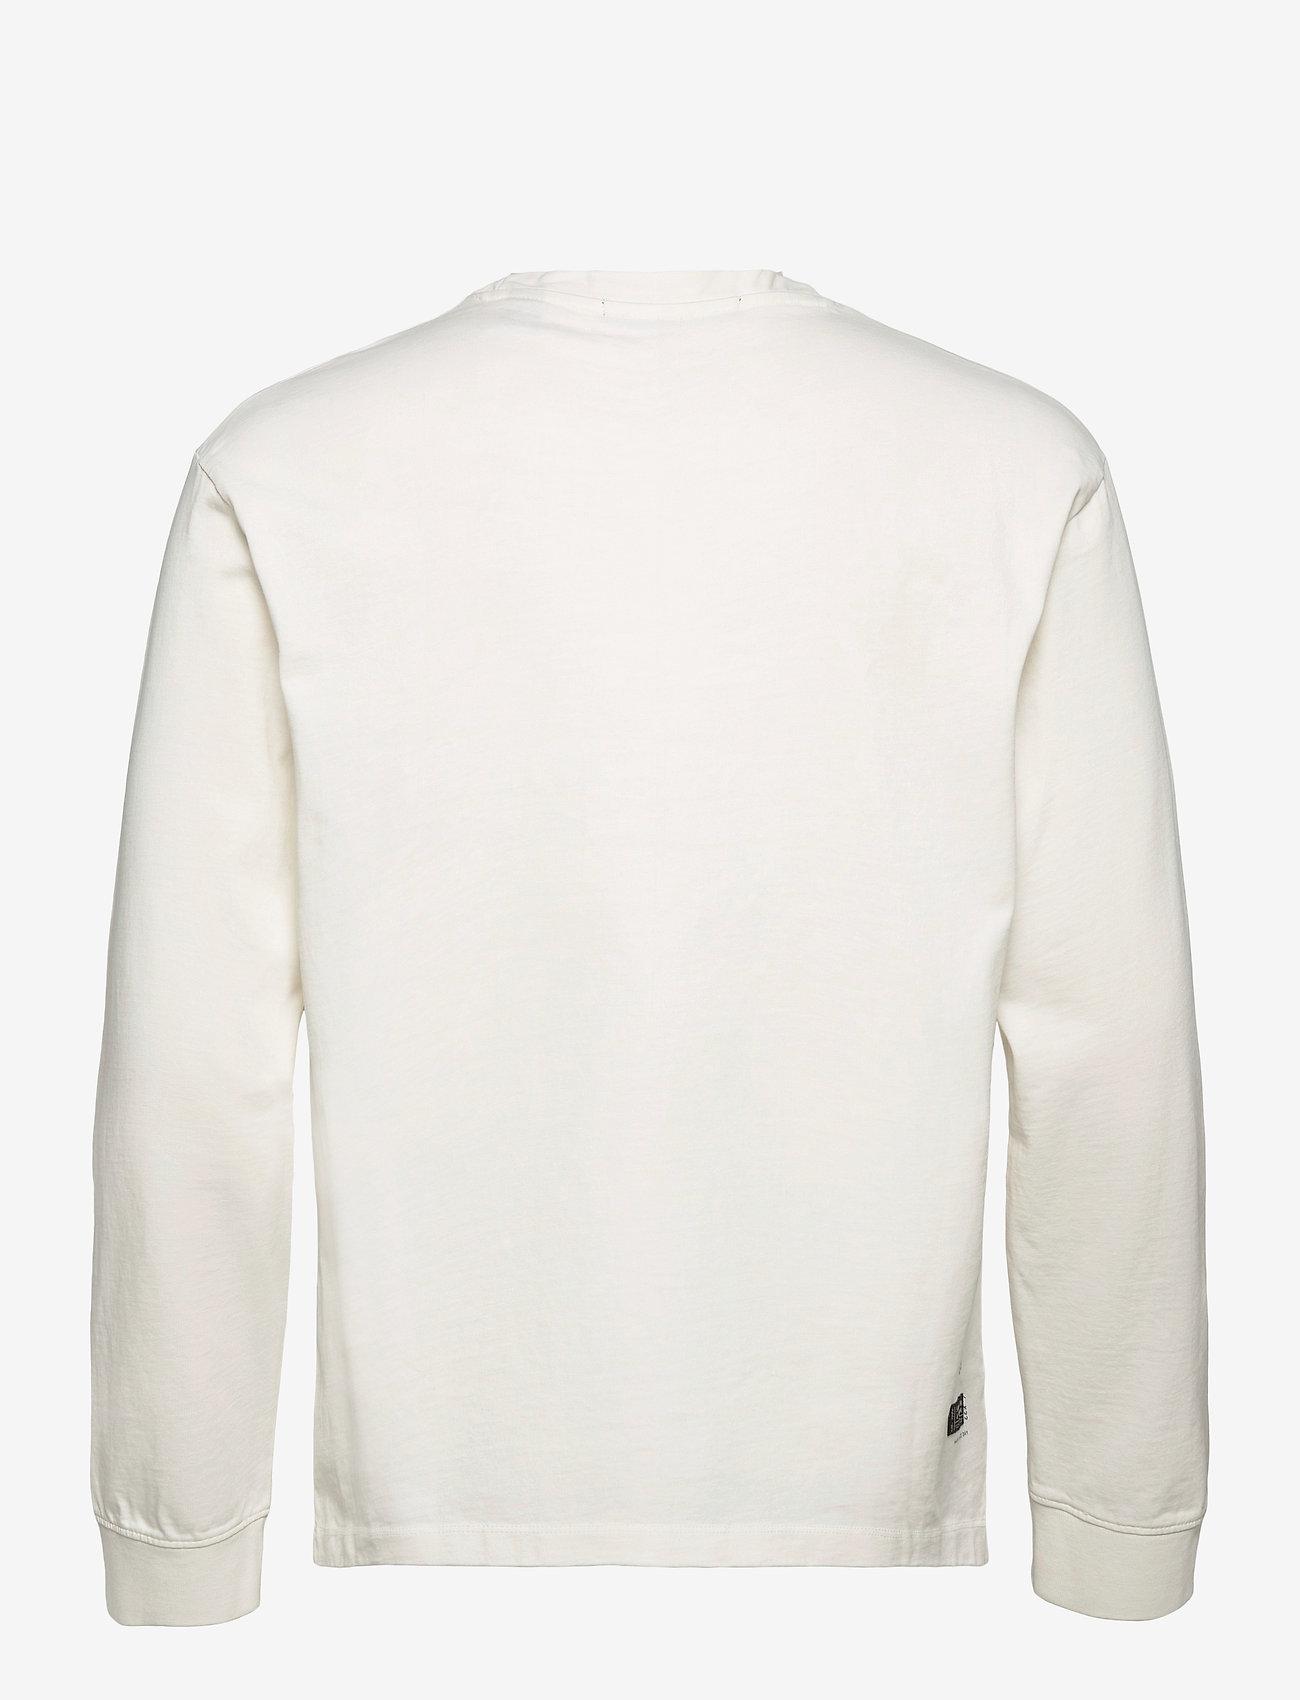 Scotch & Soda - Organic cotton-jersey longsleeve artwork tee - podstawowe koszulki - denim white - 1